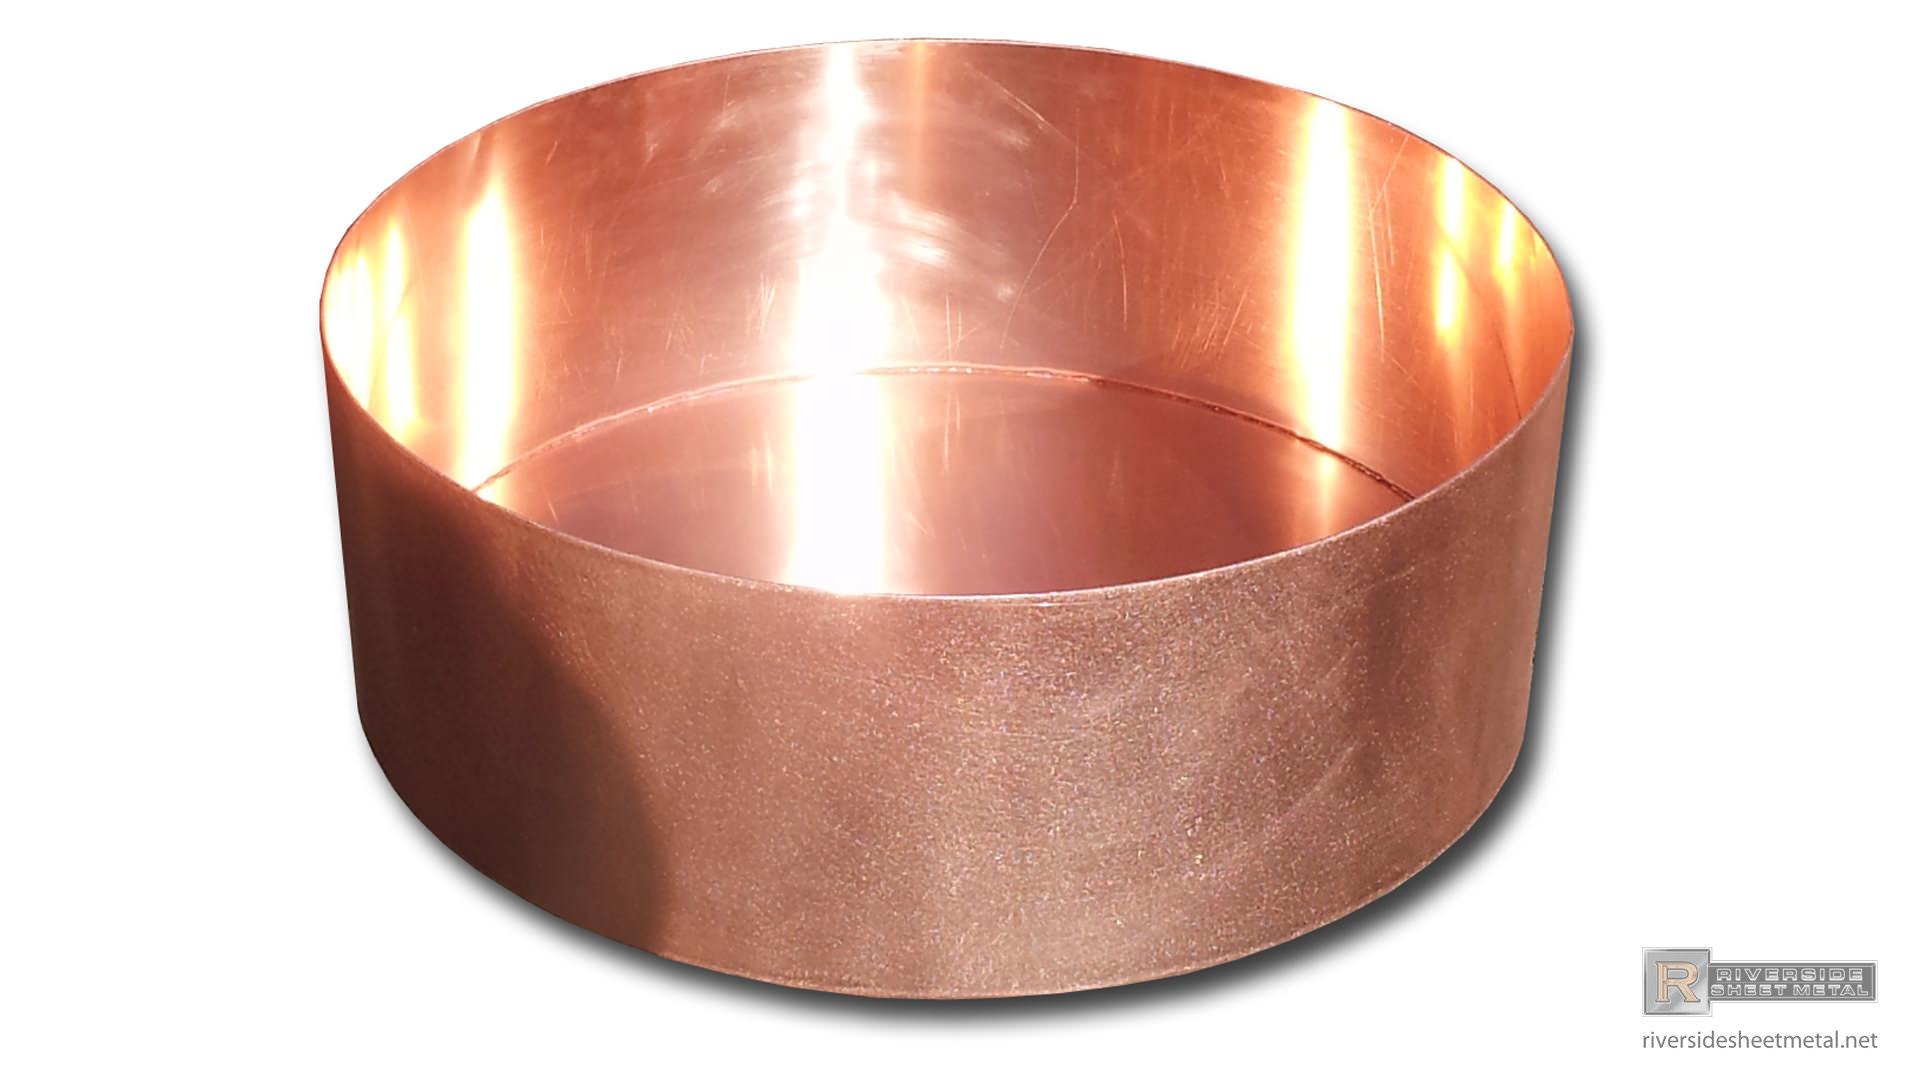 Round Copper Planter Custom Fabricated Riverside Sheet Metal